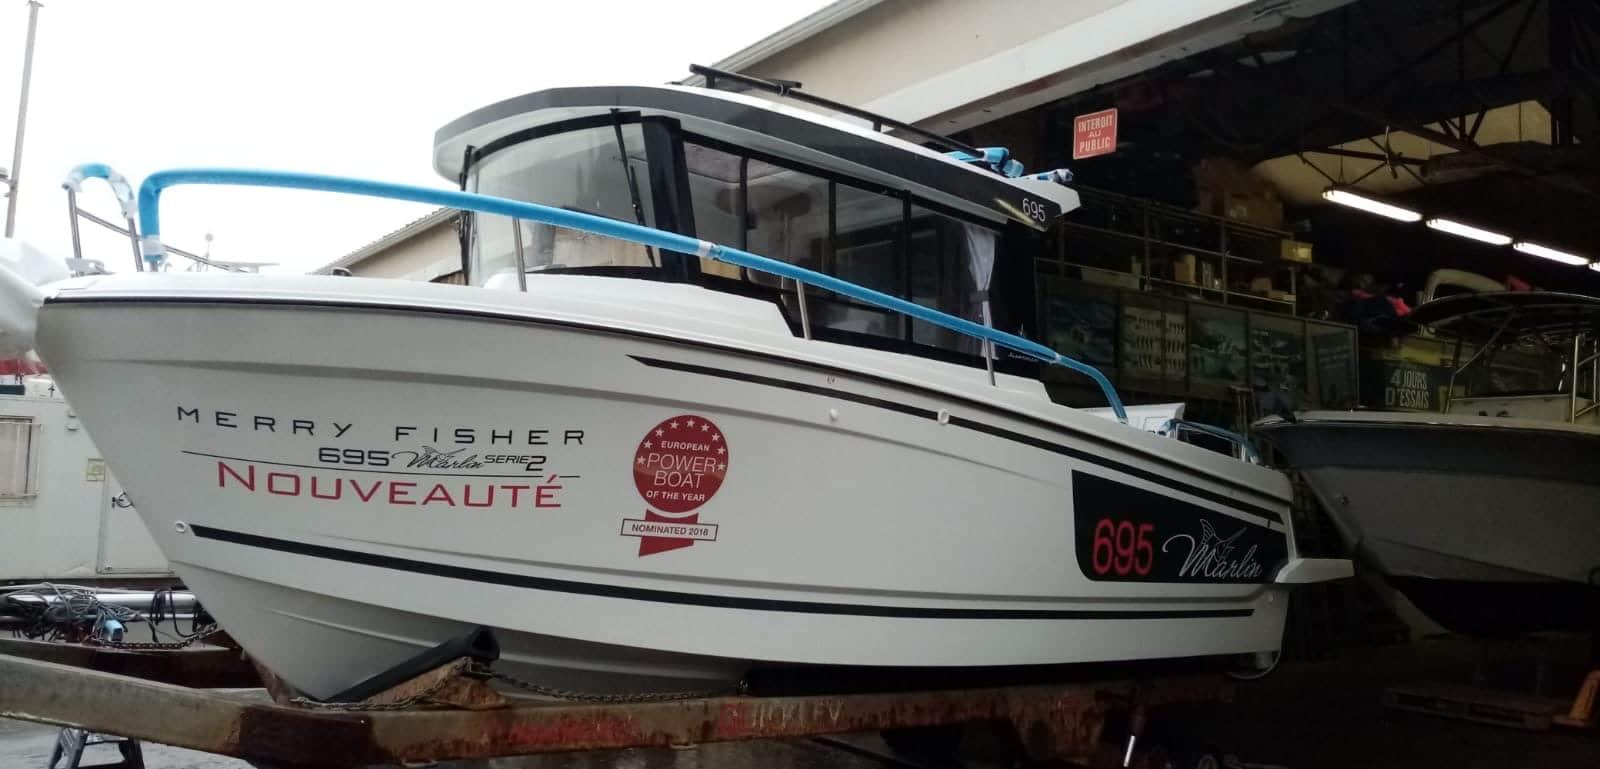 Merry Fisher 695 Marlin s2 en exclusivité à Atlantica